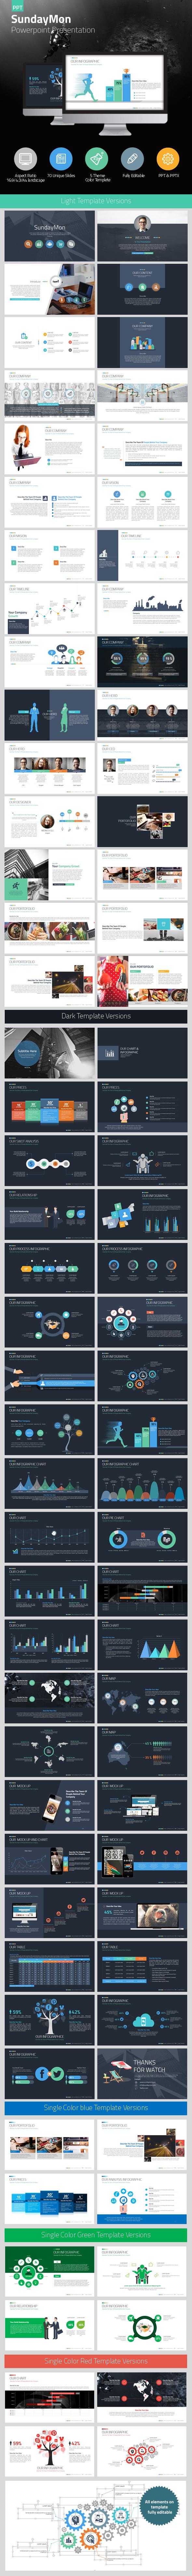 SundayMon PowerpointPresentation - PowerPoint Templates Presentation Templates